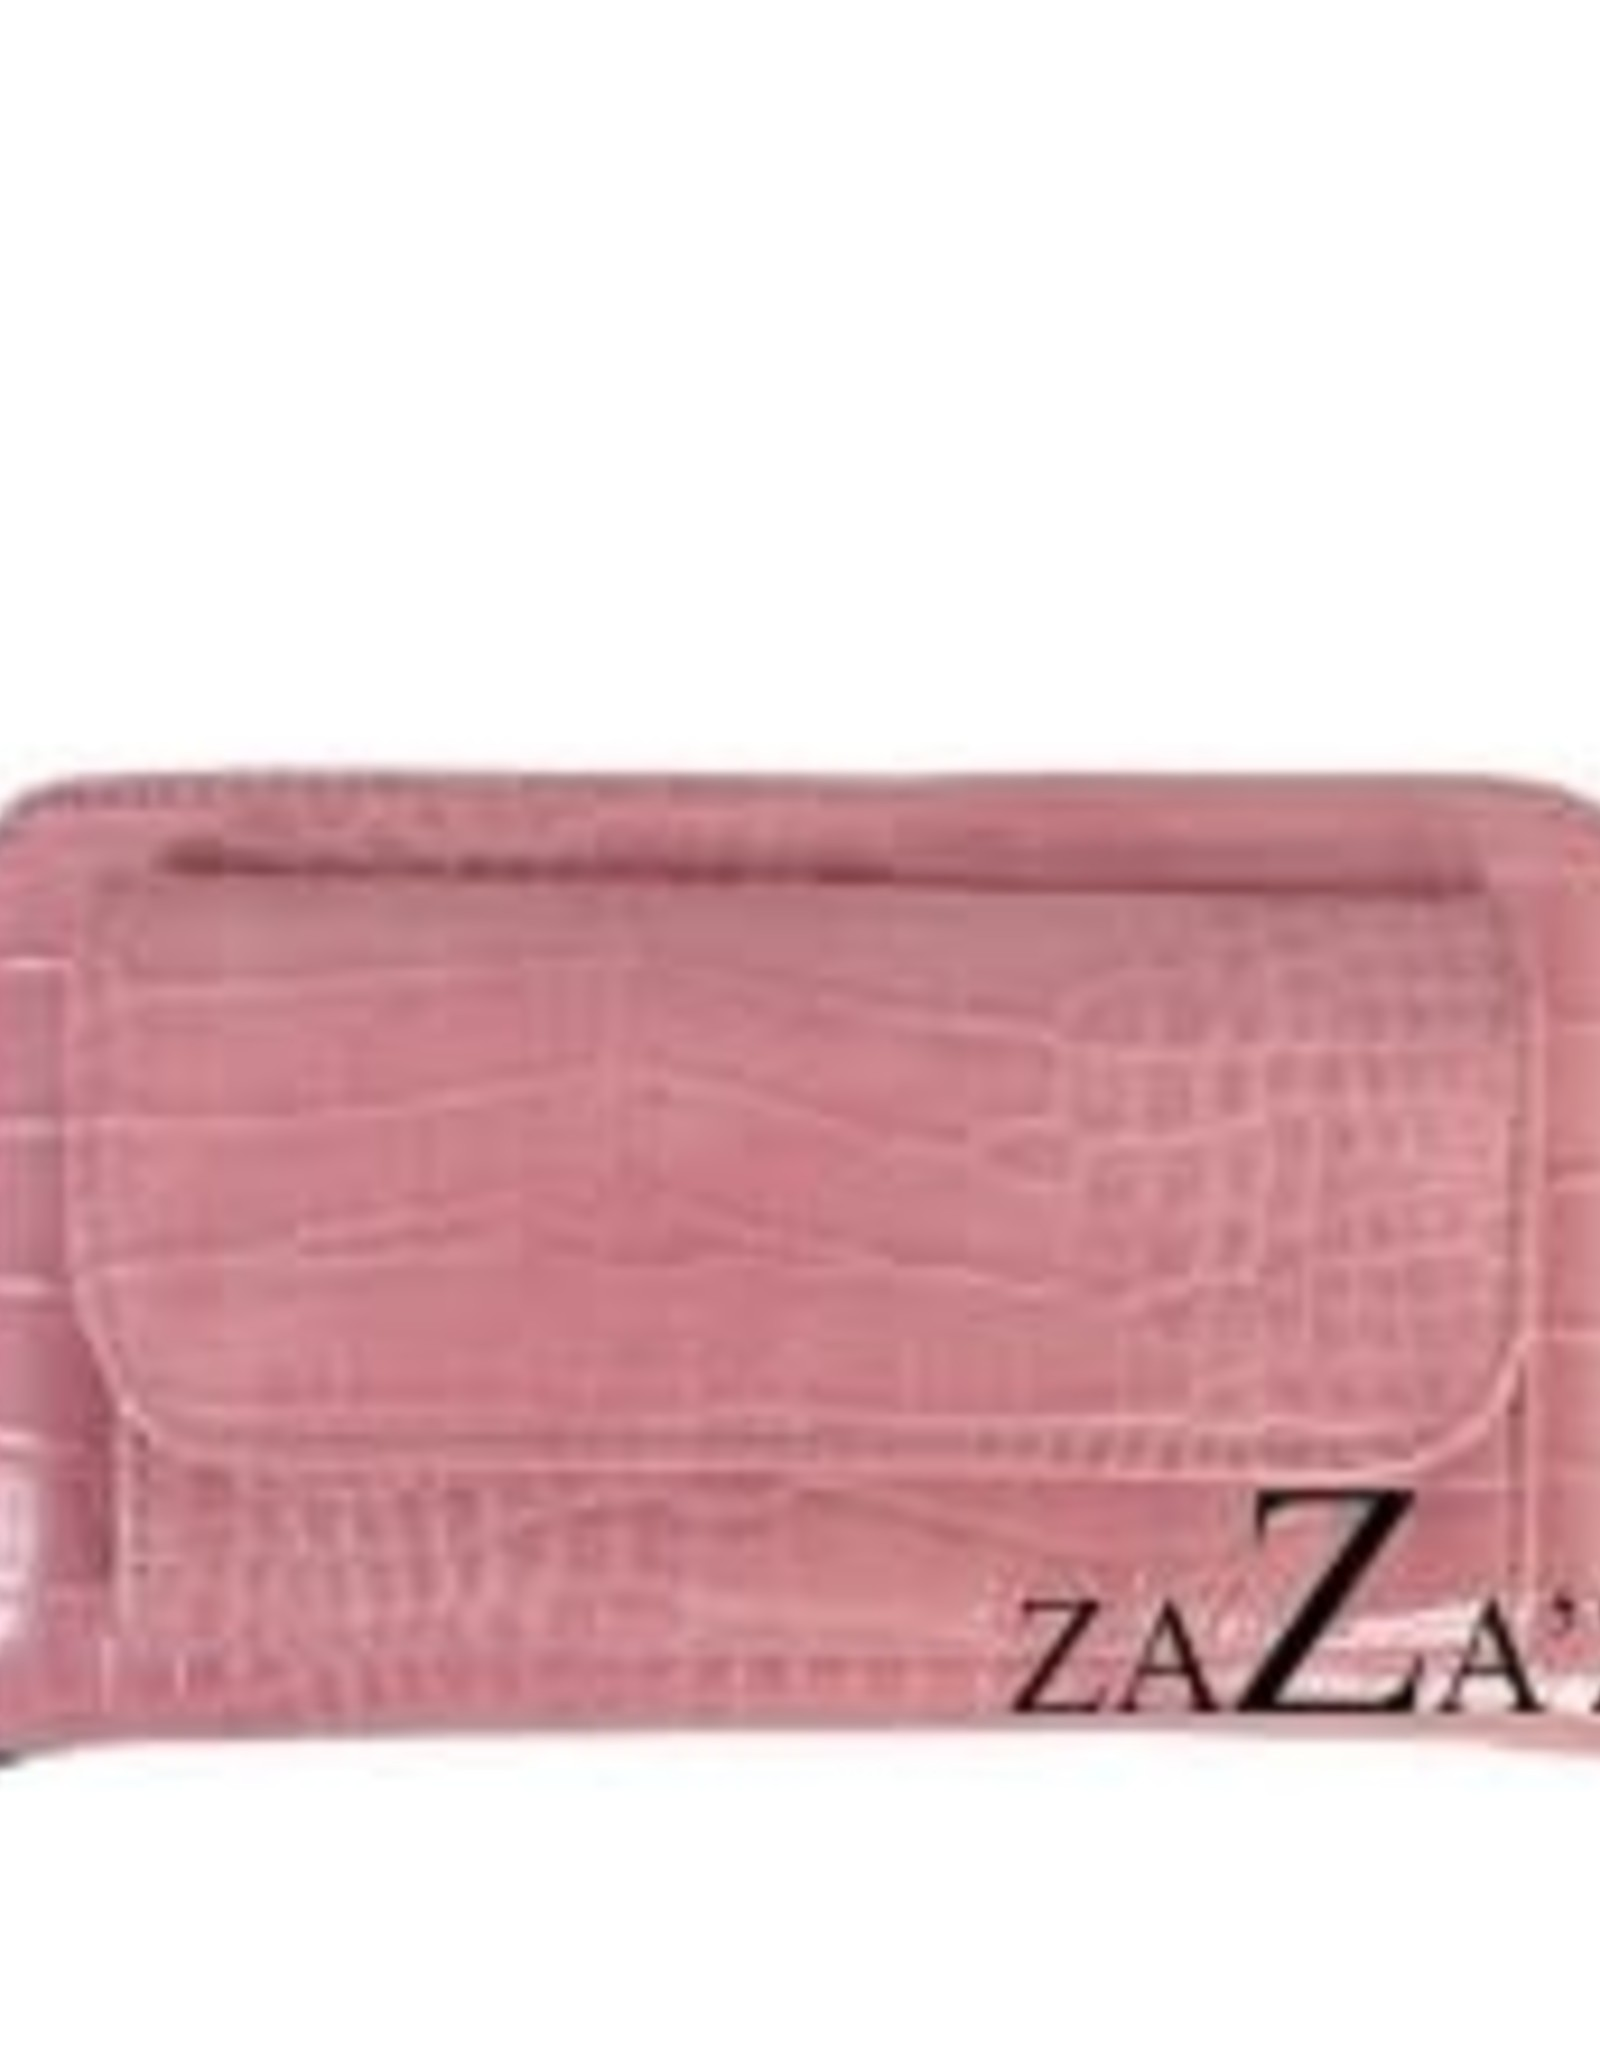 zaza'z zaza'z portemonnee groot roze